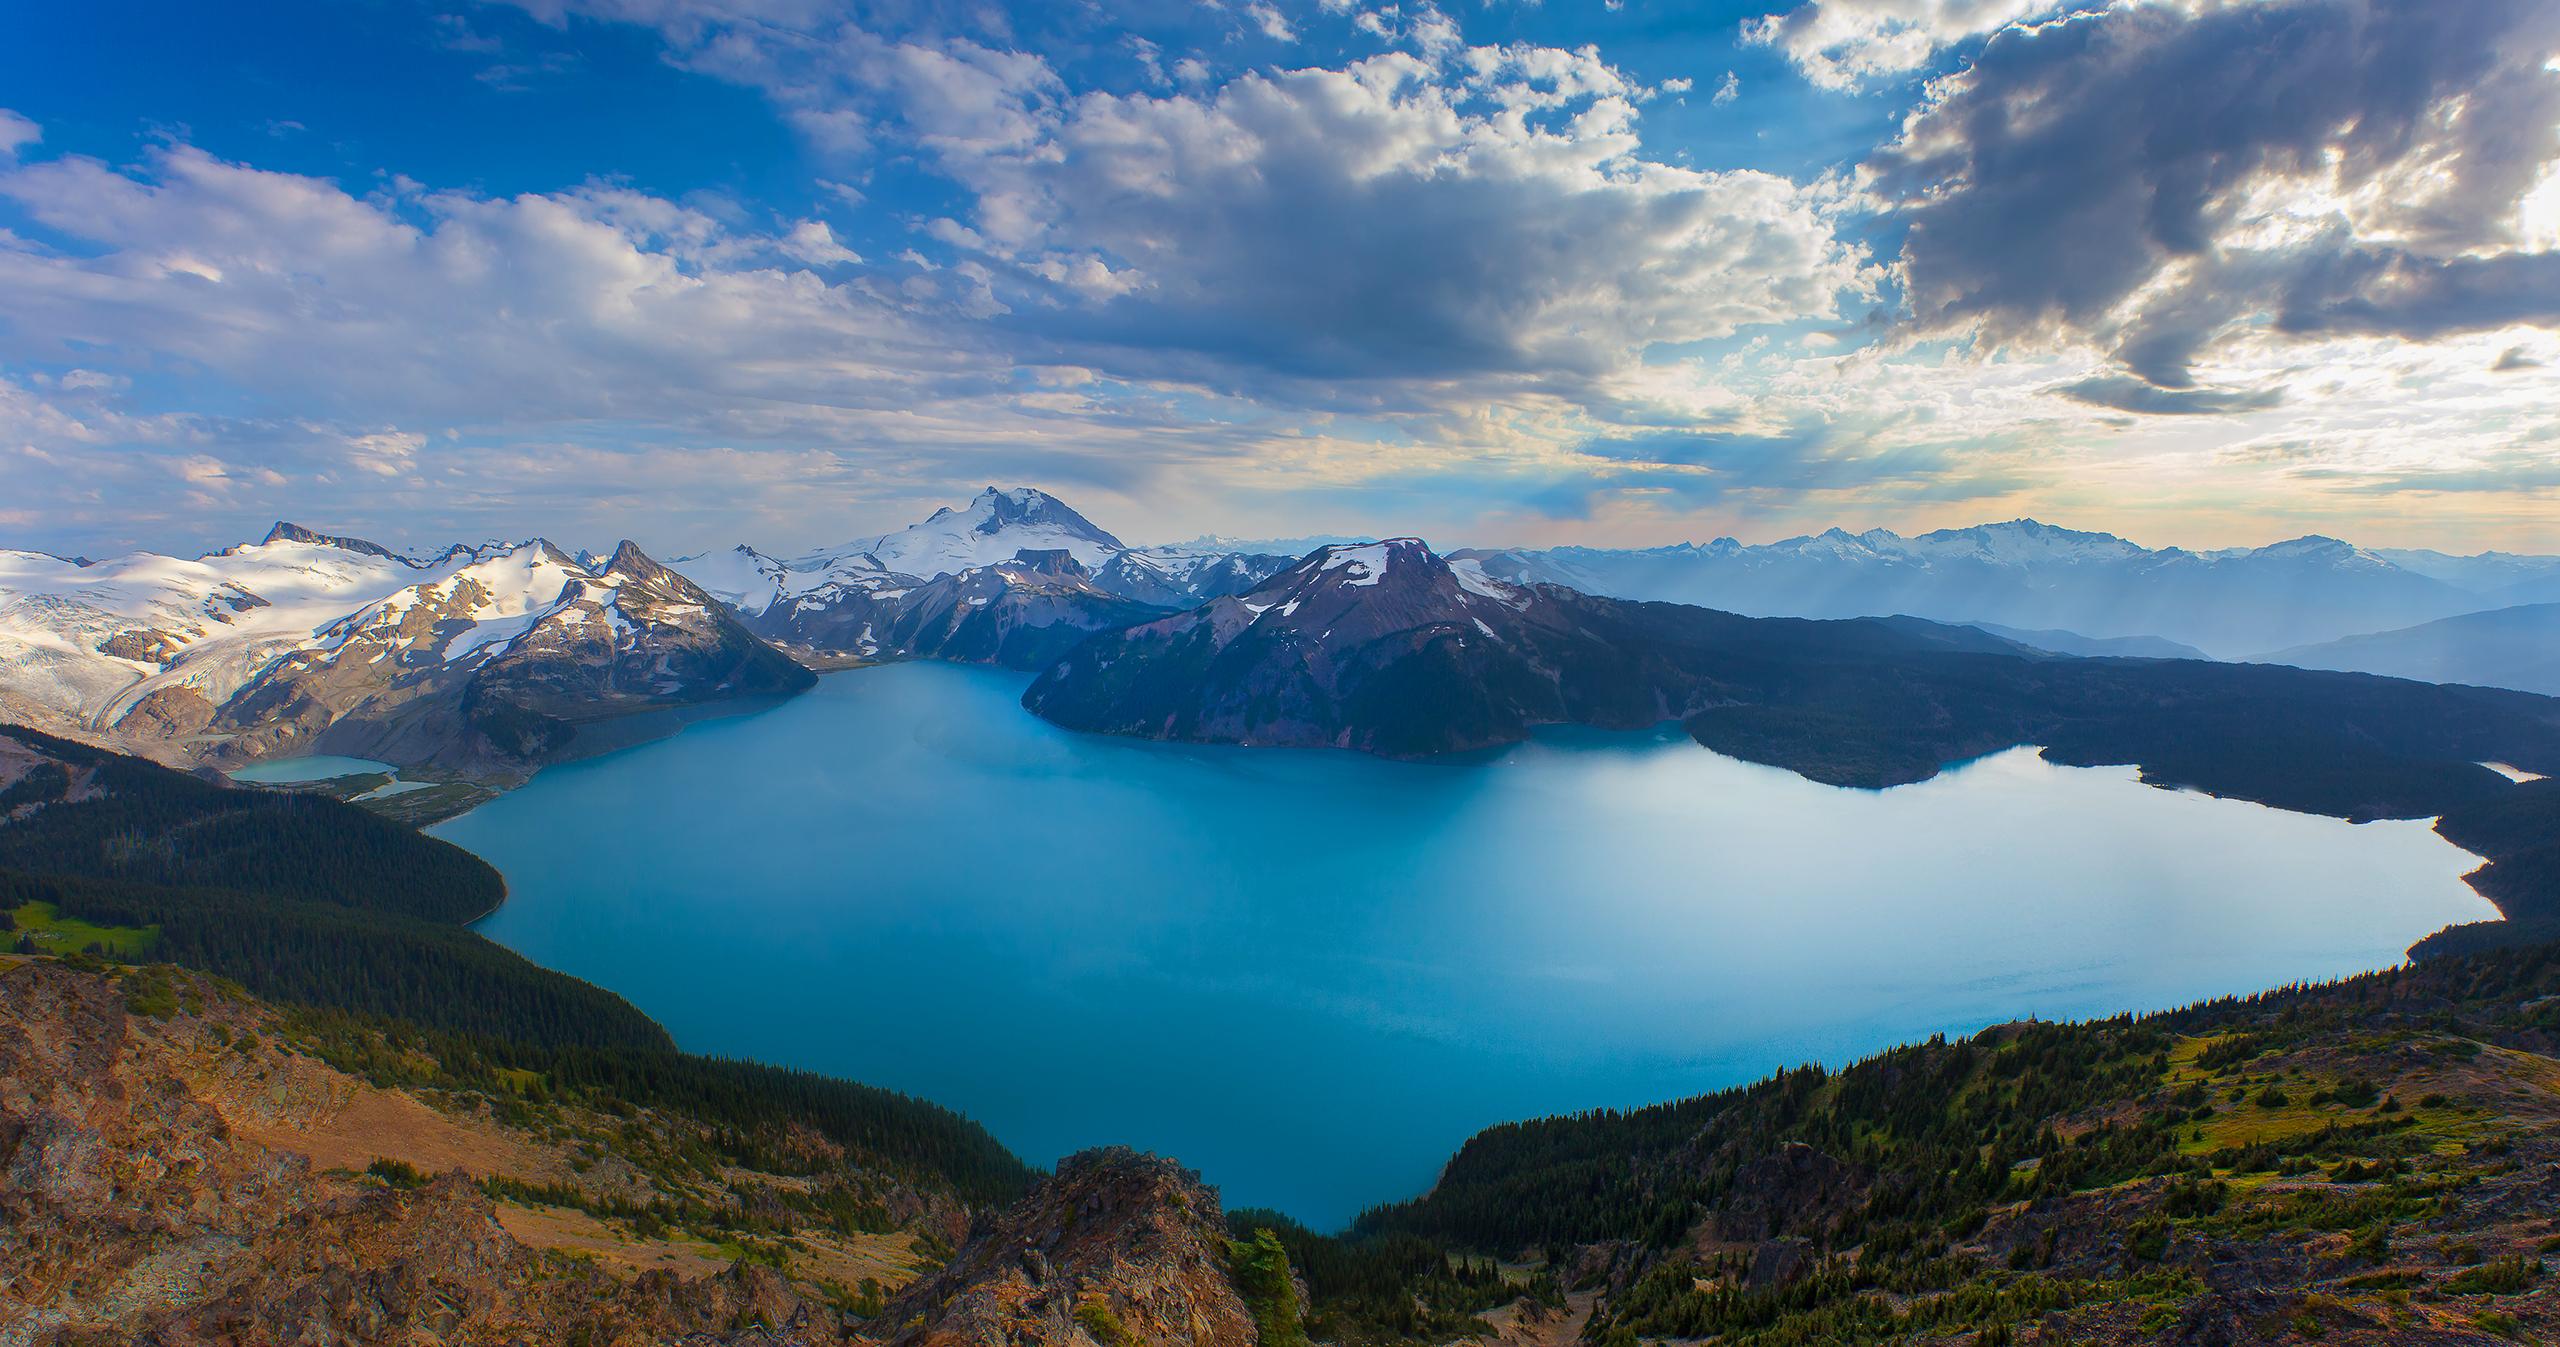 Wallpaper British Columbia Canada Mountains Lake View